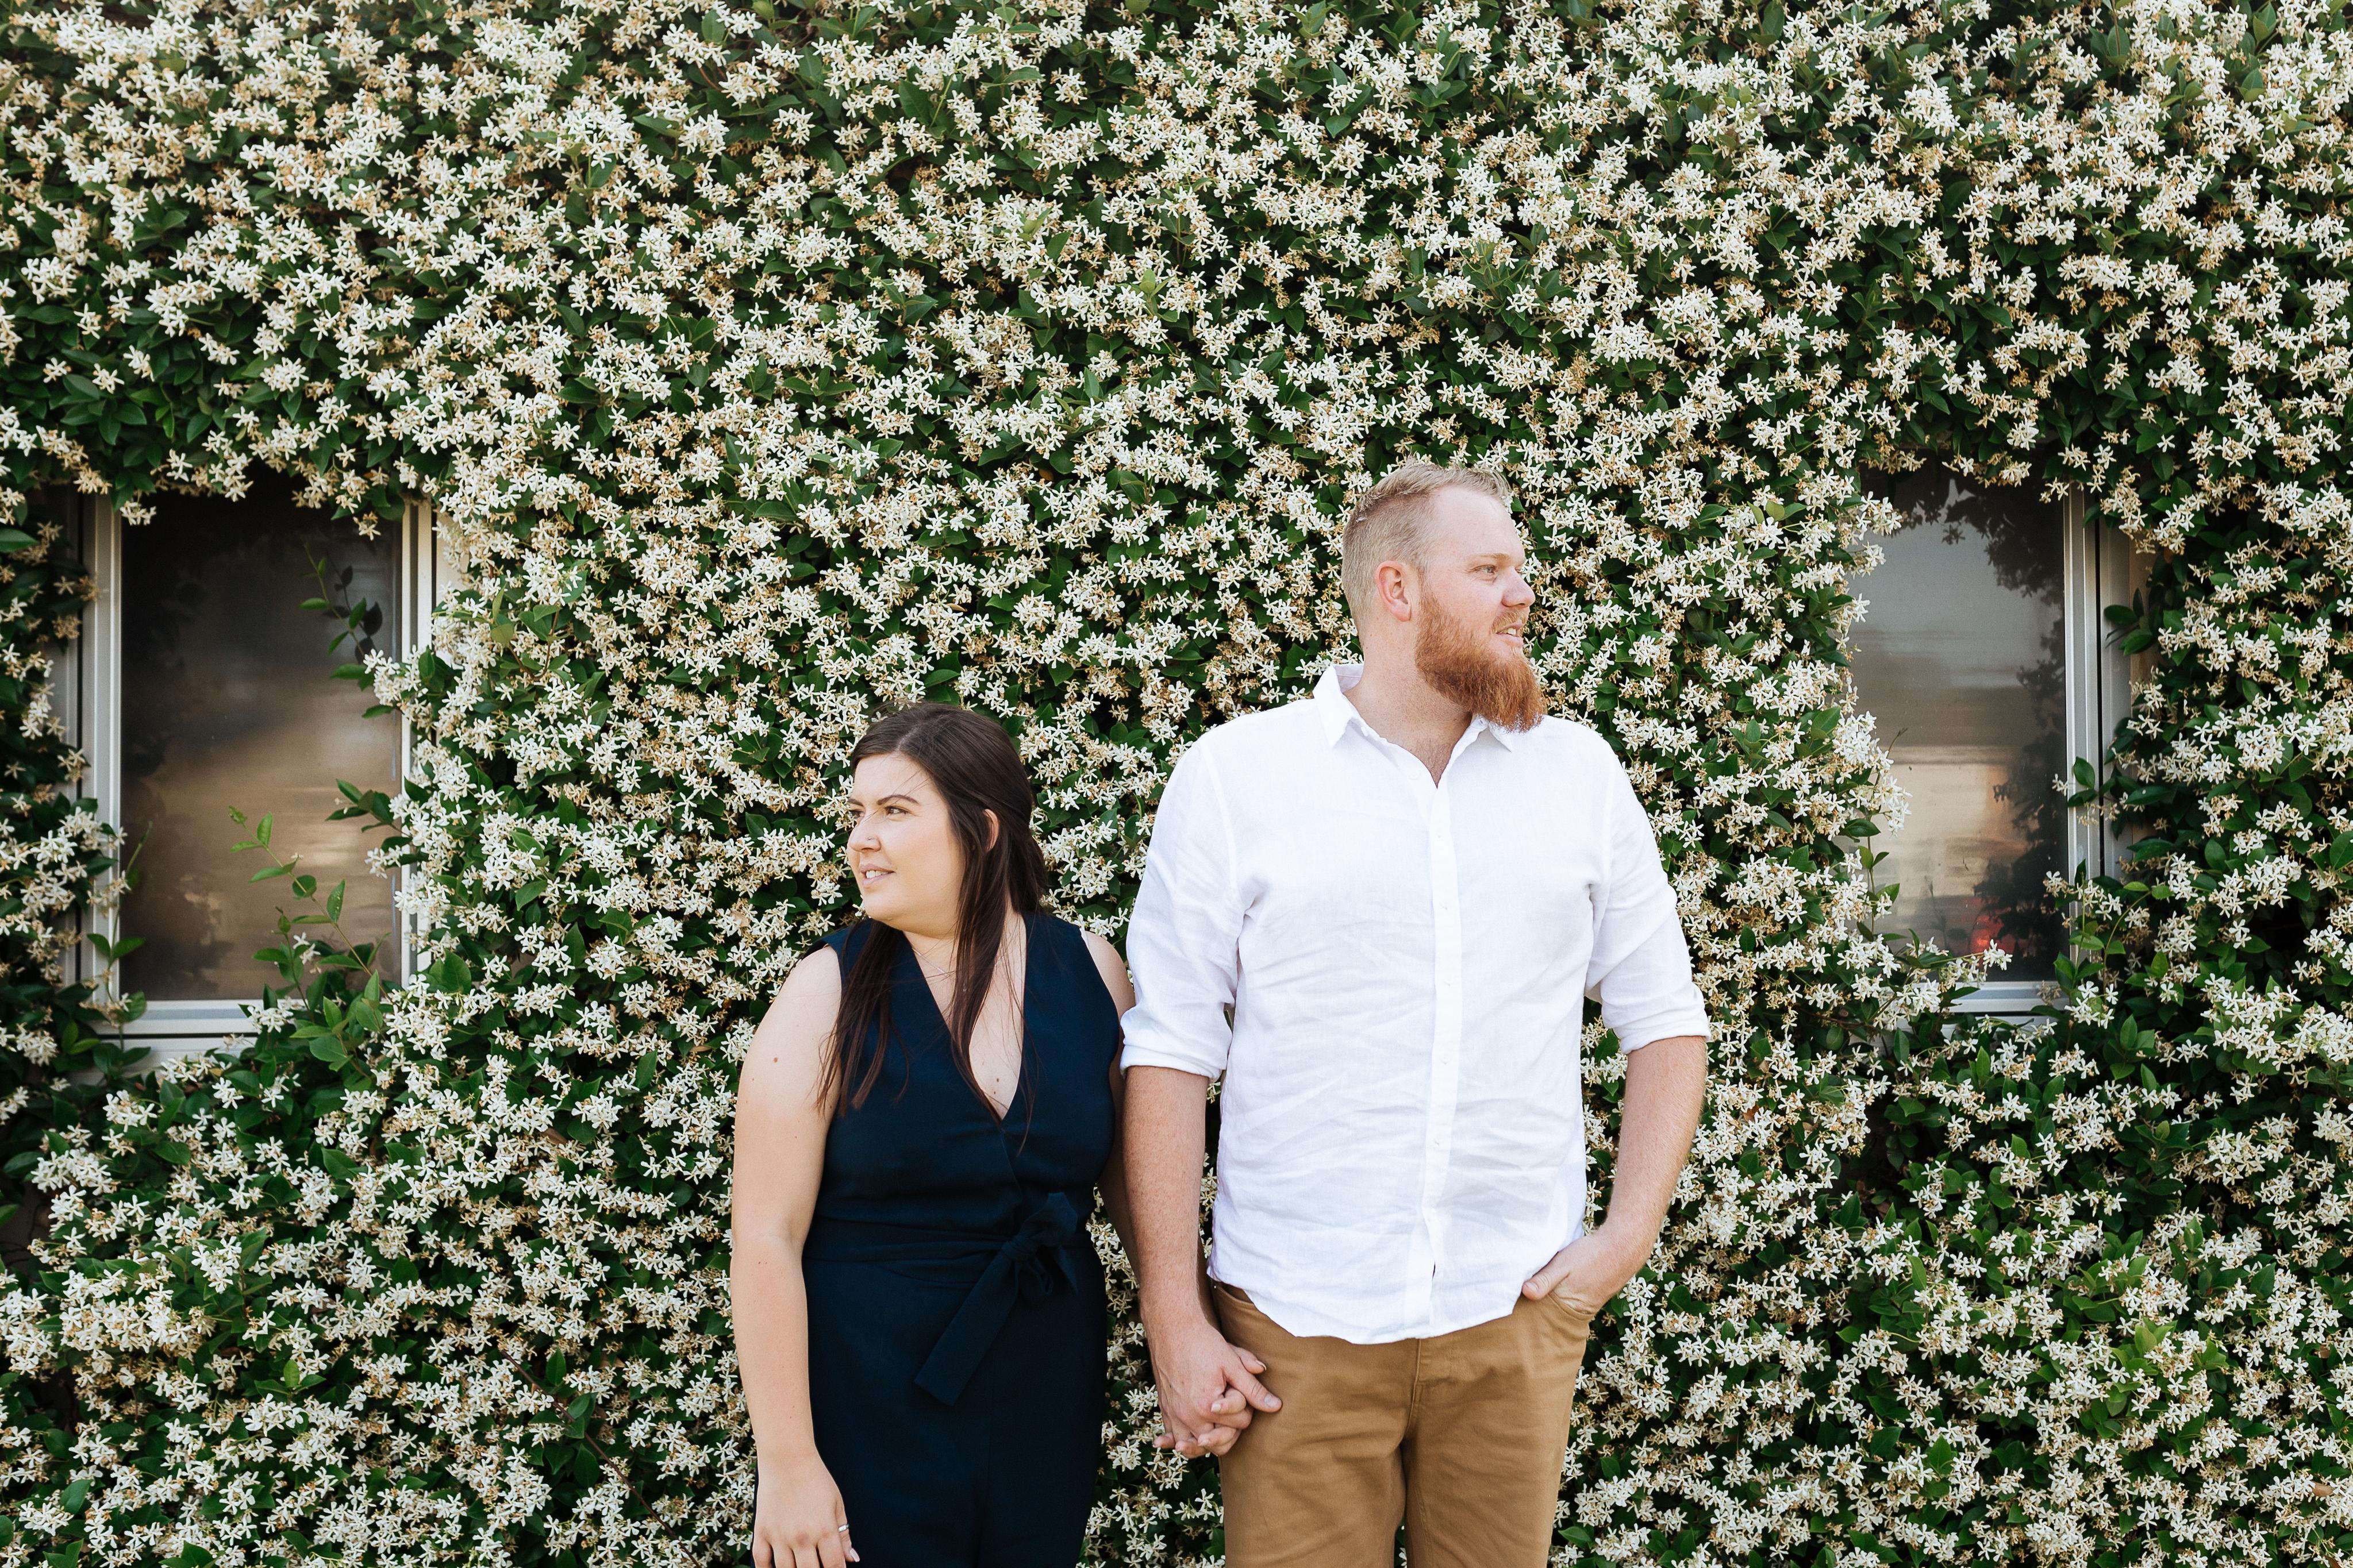 Courtney-Black-Hunter-Valley-Engagement-7252